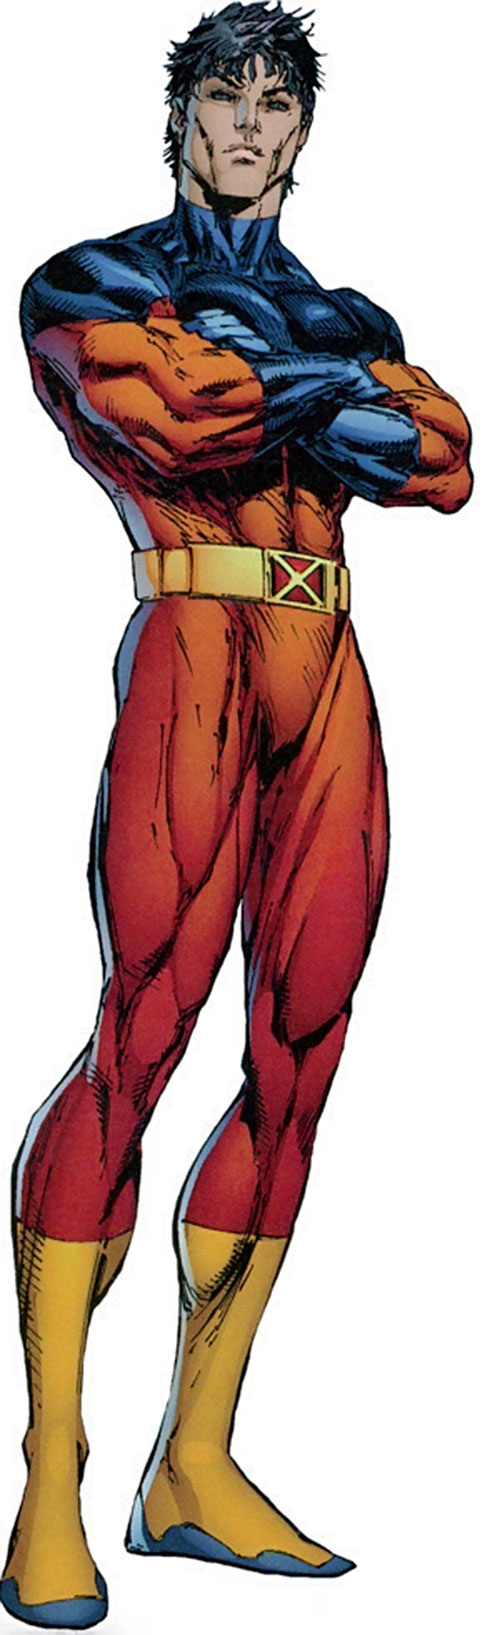 Vulcan - Marvel Comics - X-Men enemy - Gabriel Summers ...